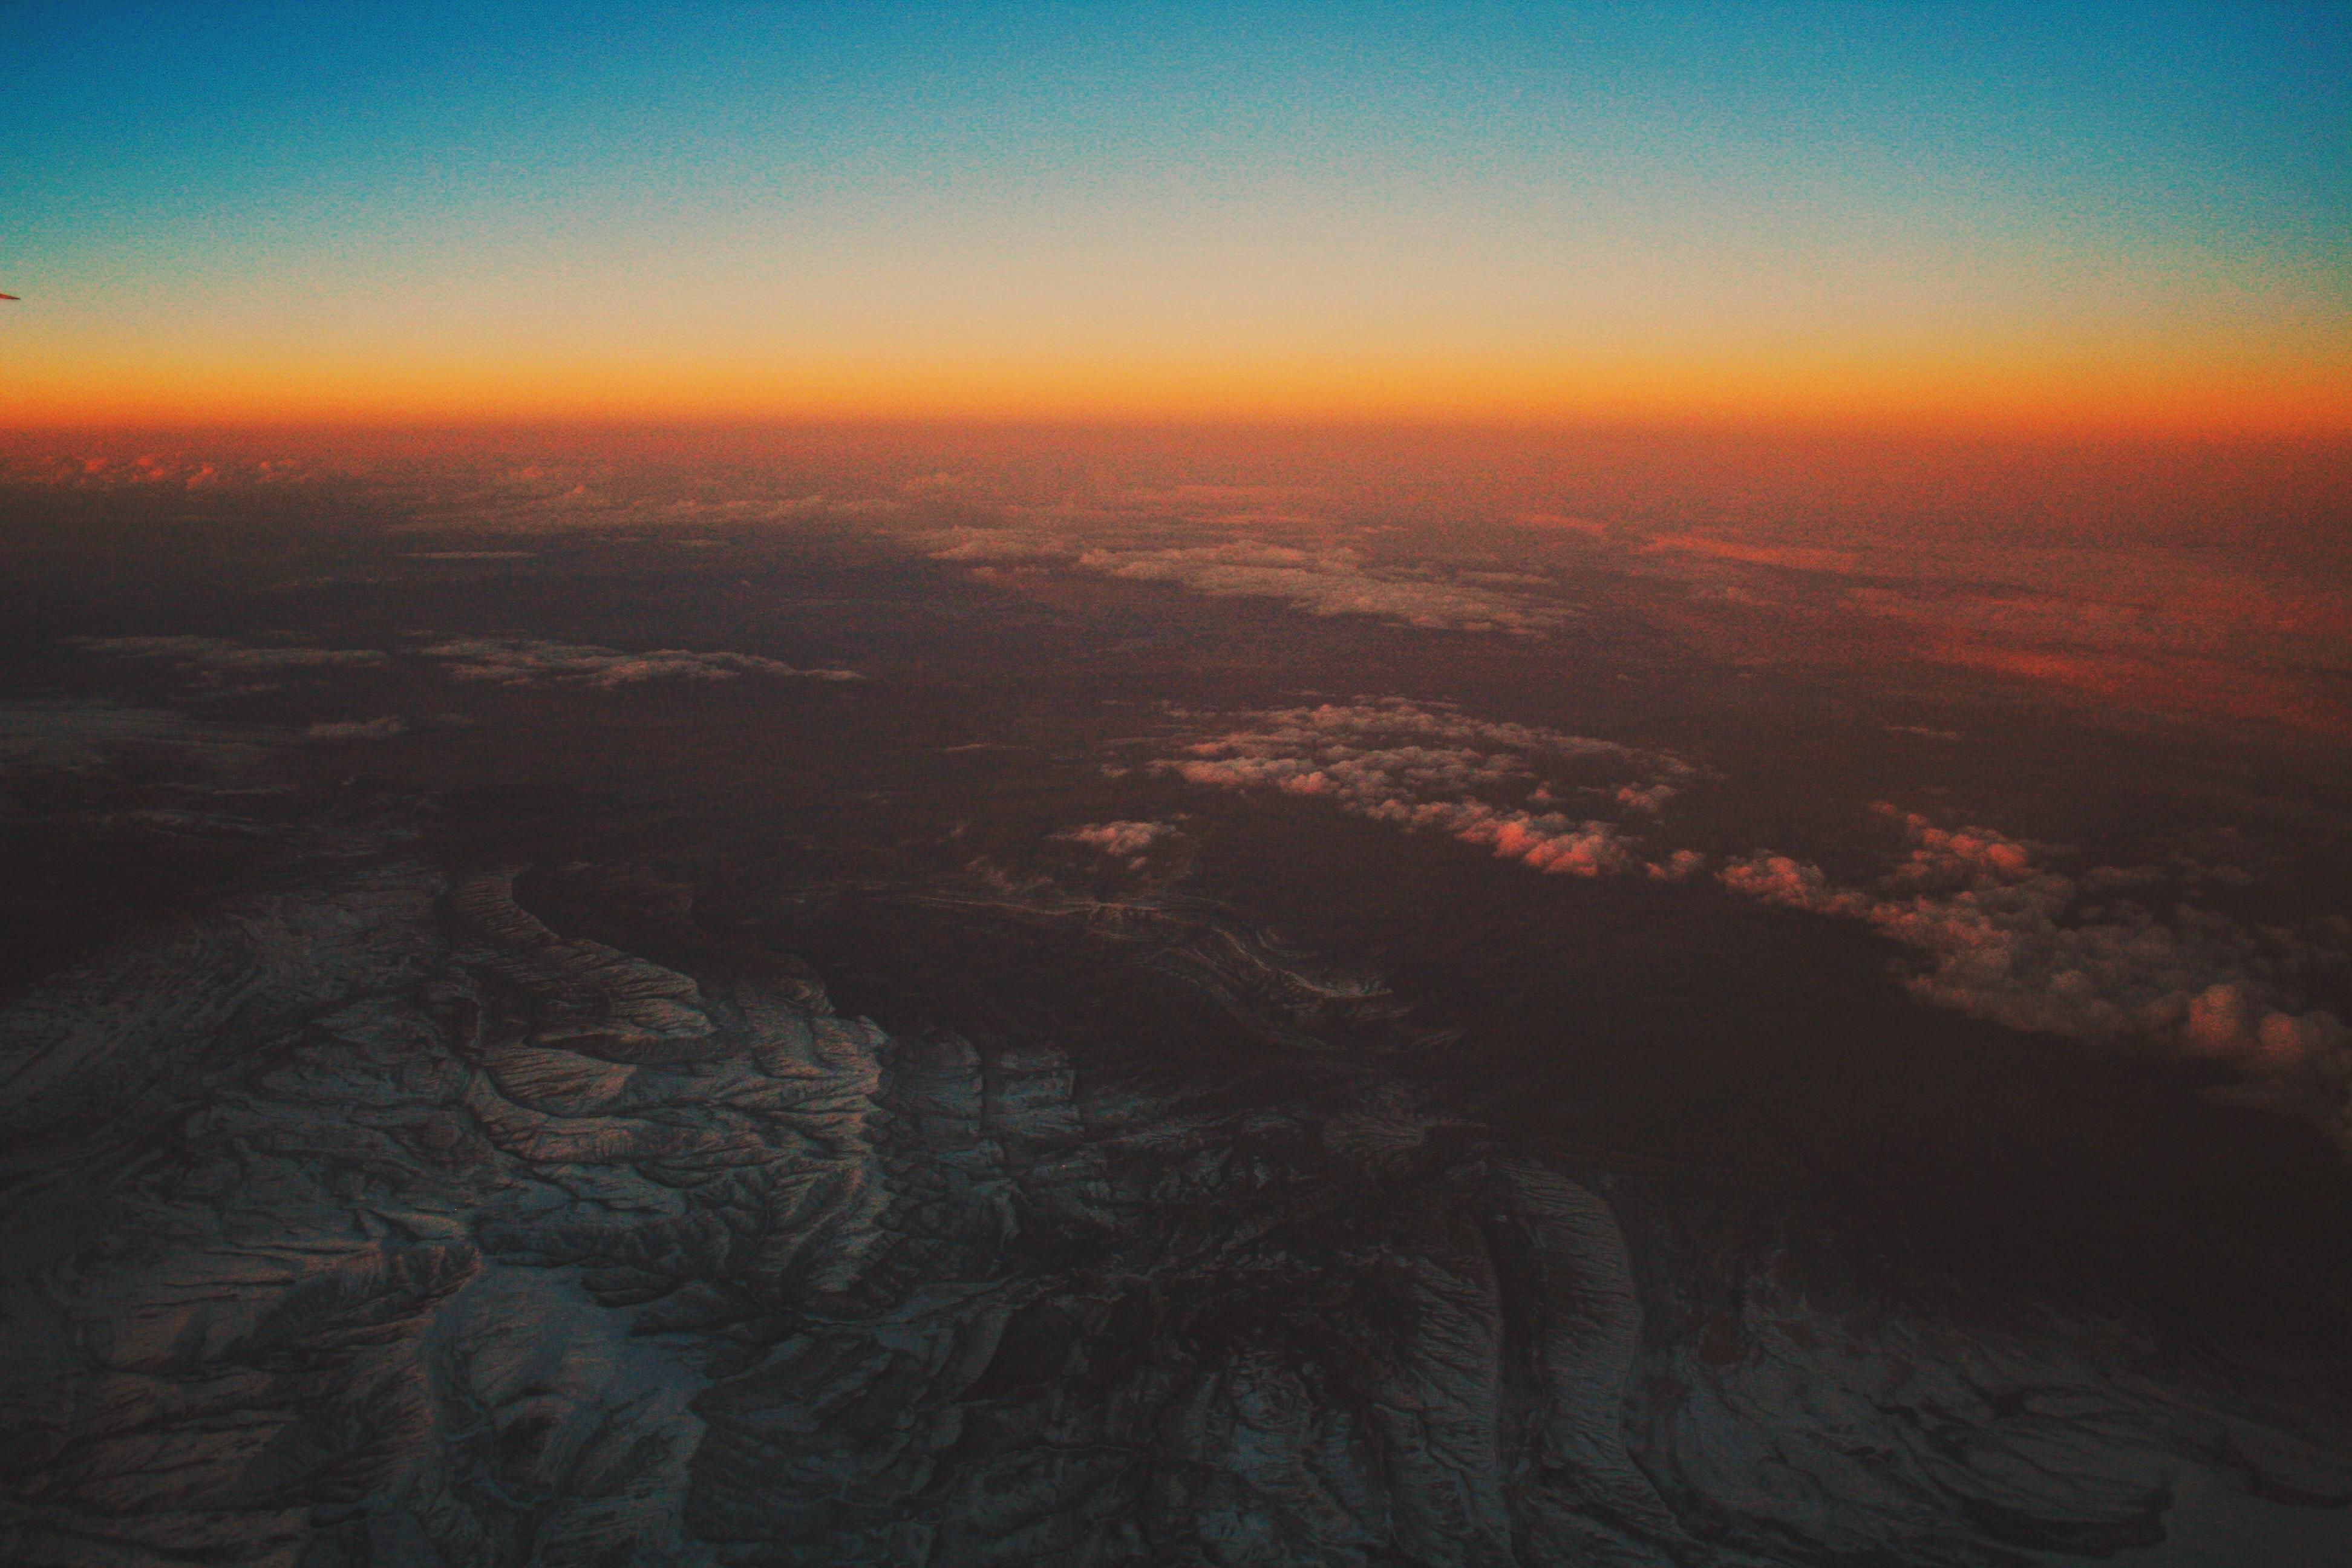 View above ridges captured over the sun kissed horizon